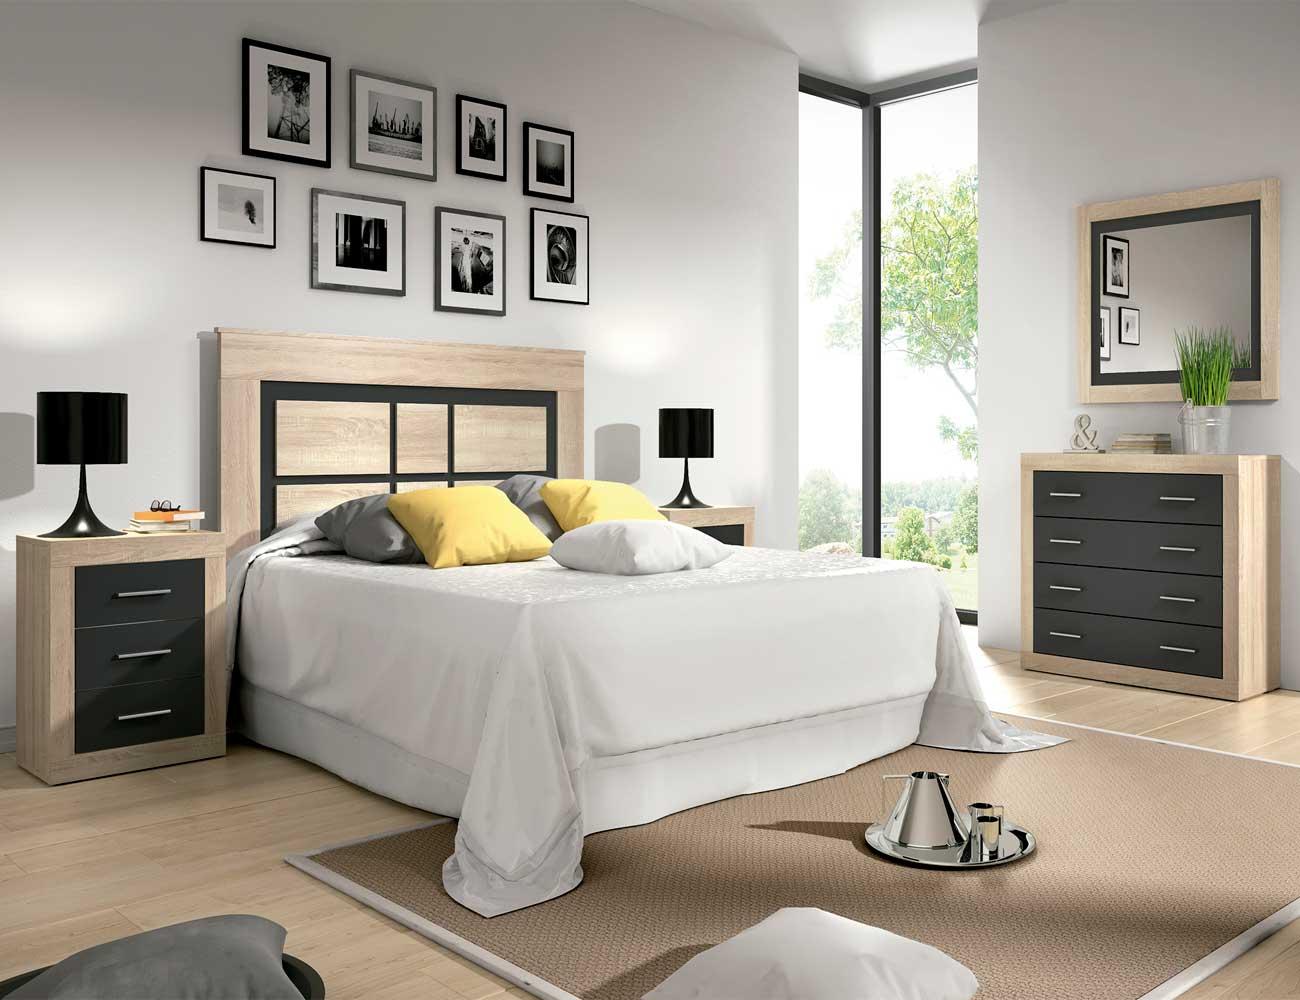 Dormitorio matrimonio estilo moderno cambrian grafito